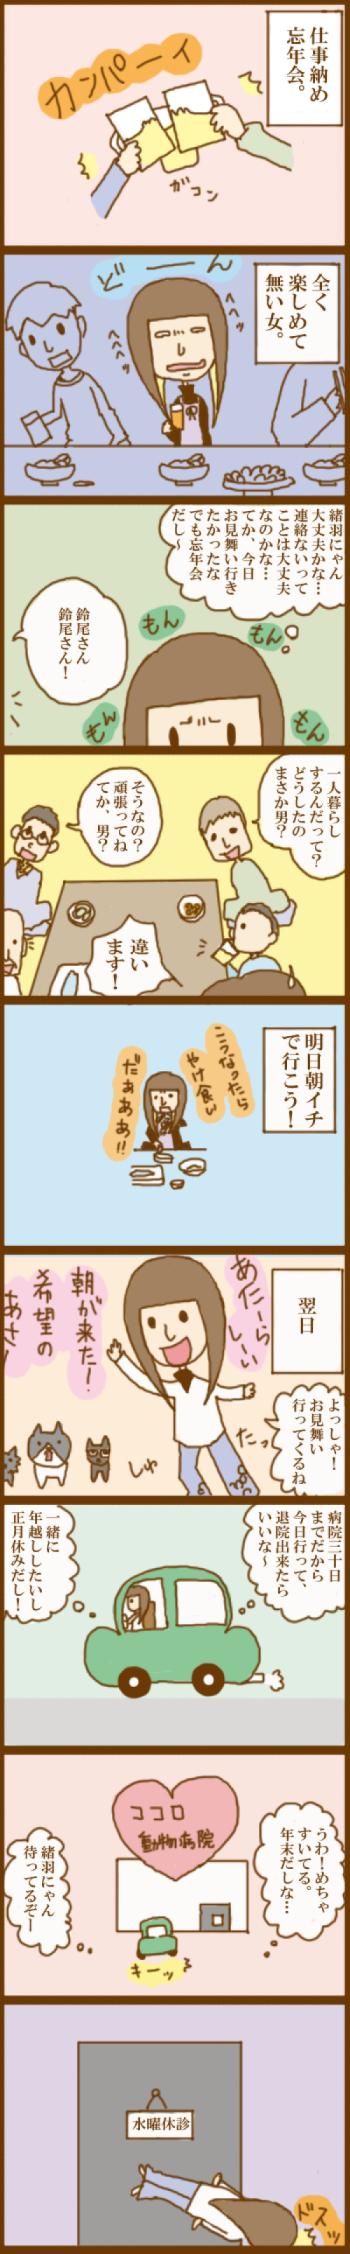 f:id:suzuokayu:20201111100058j:plain